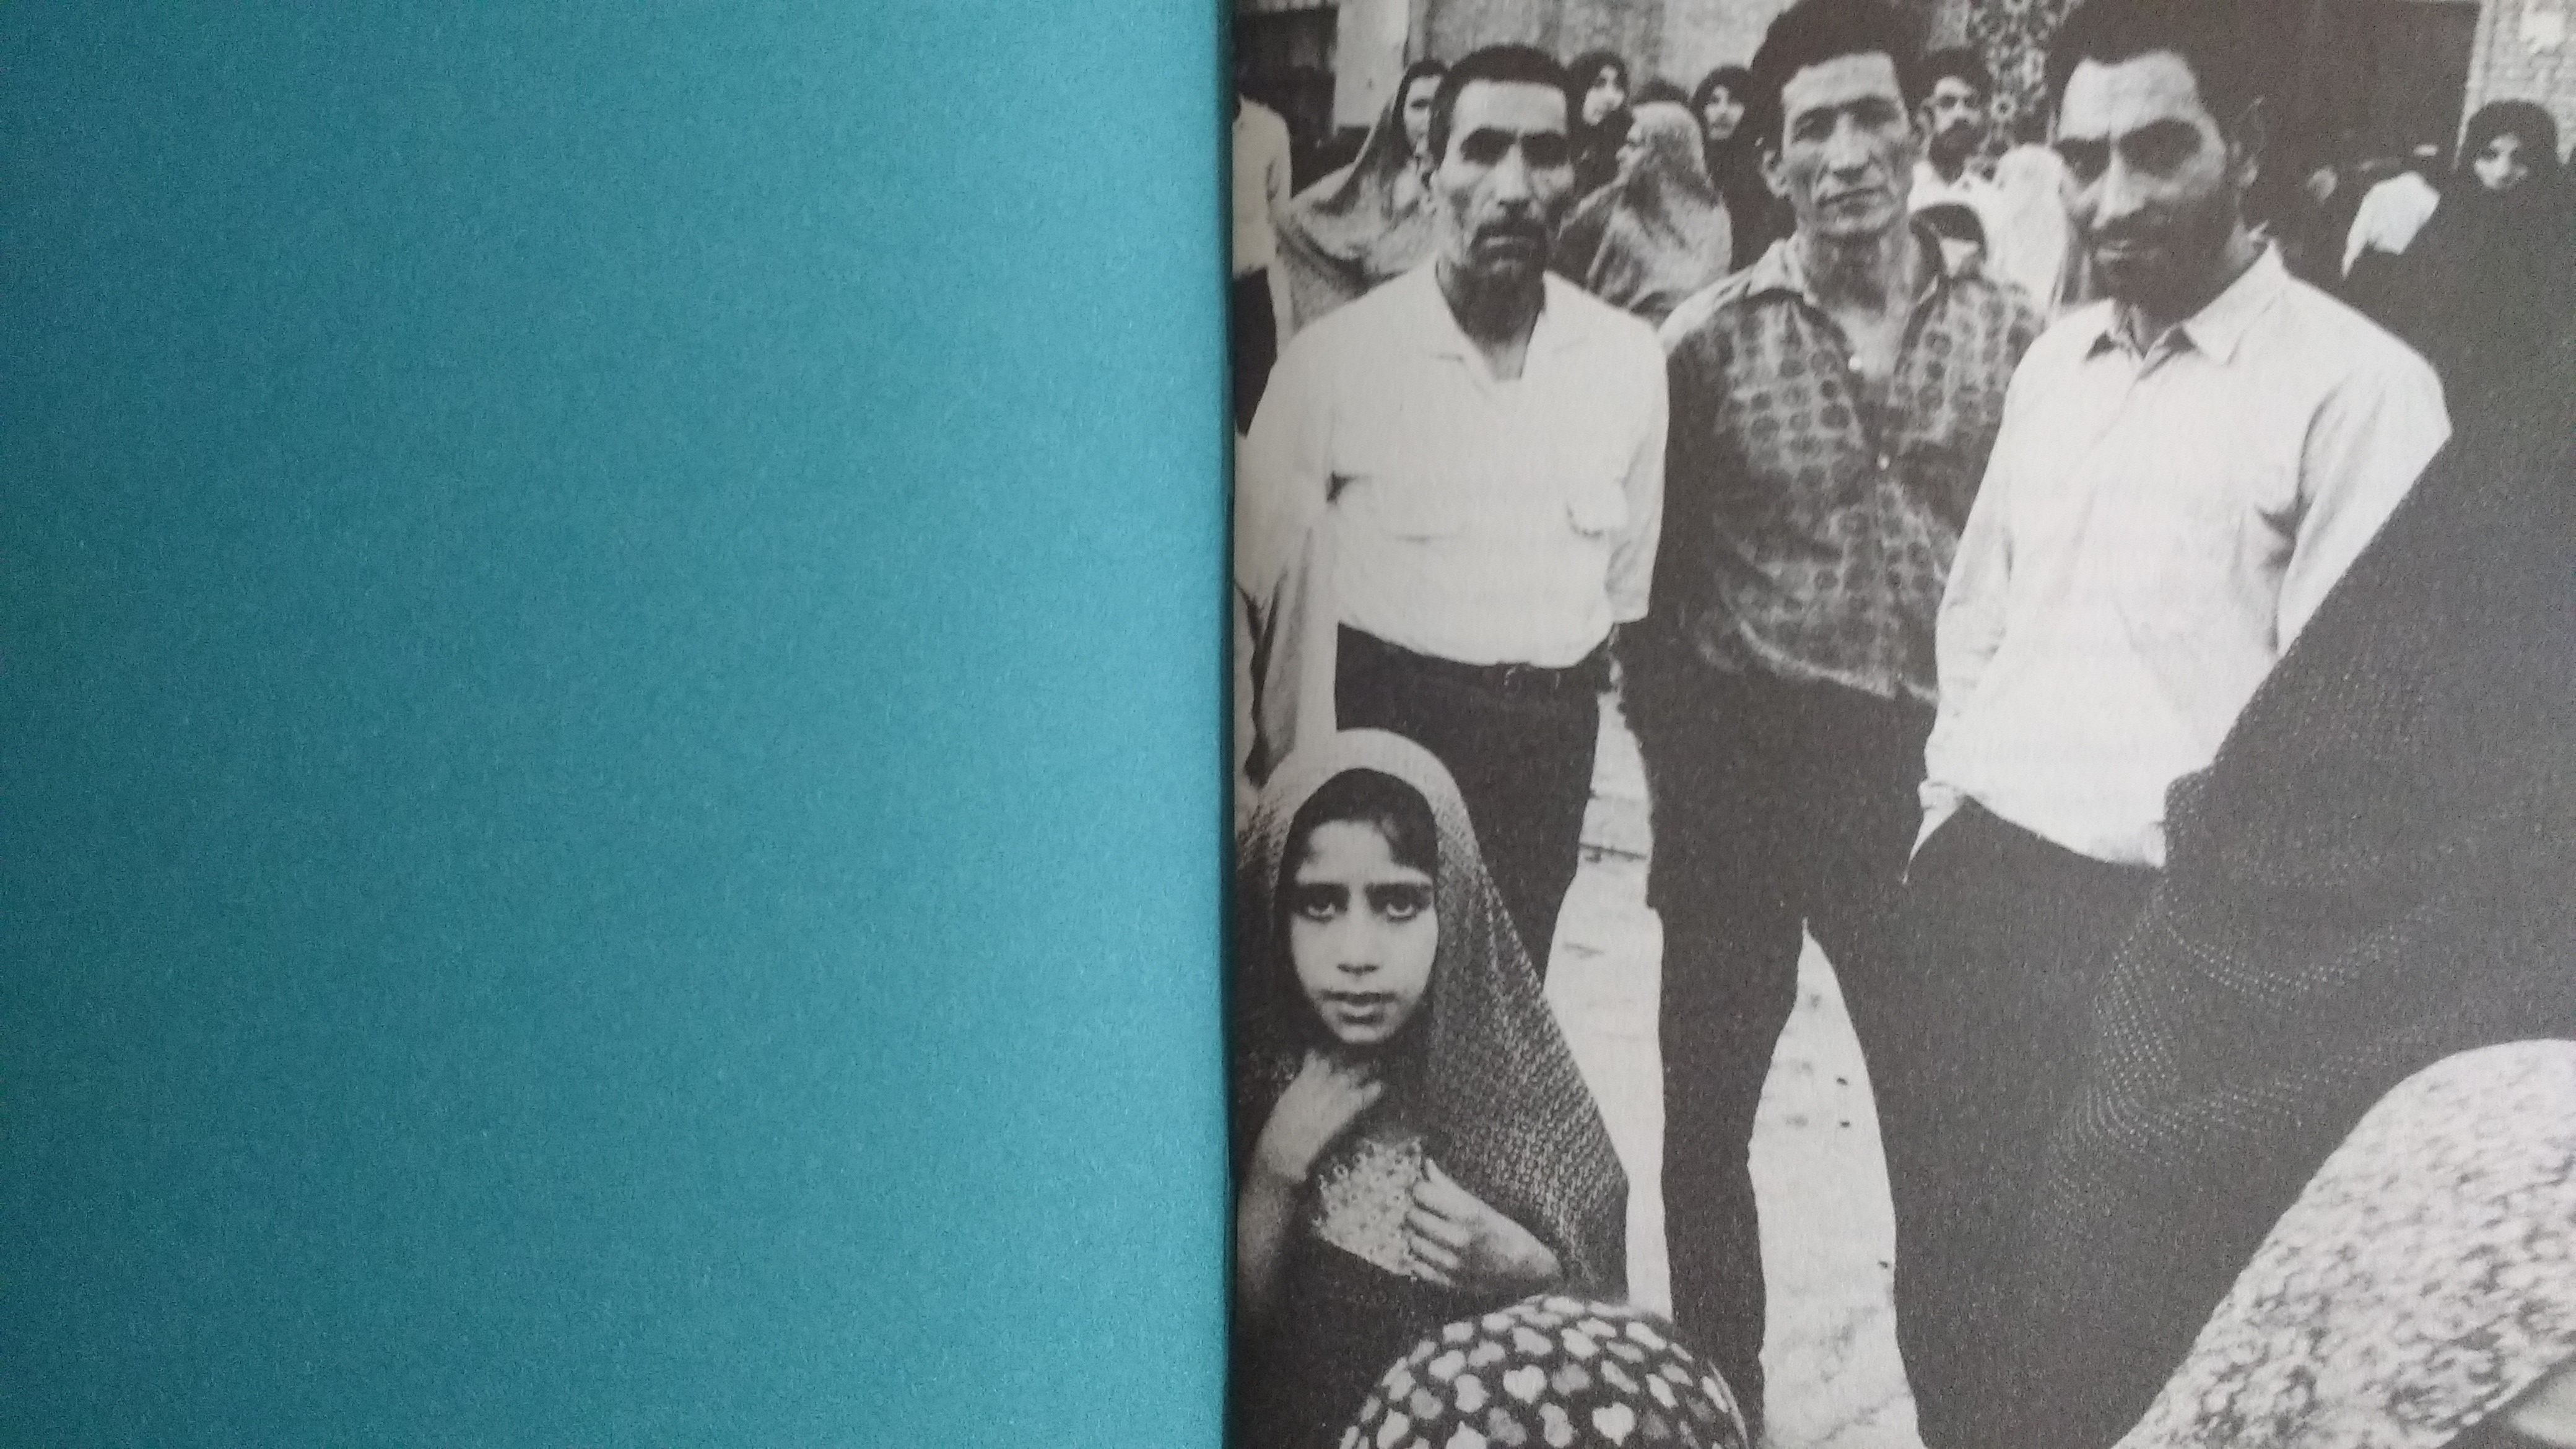 Iran 1970 by Gabriele Basilico